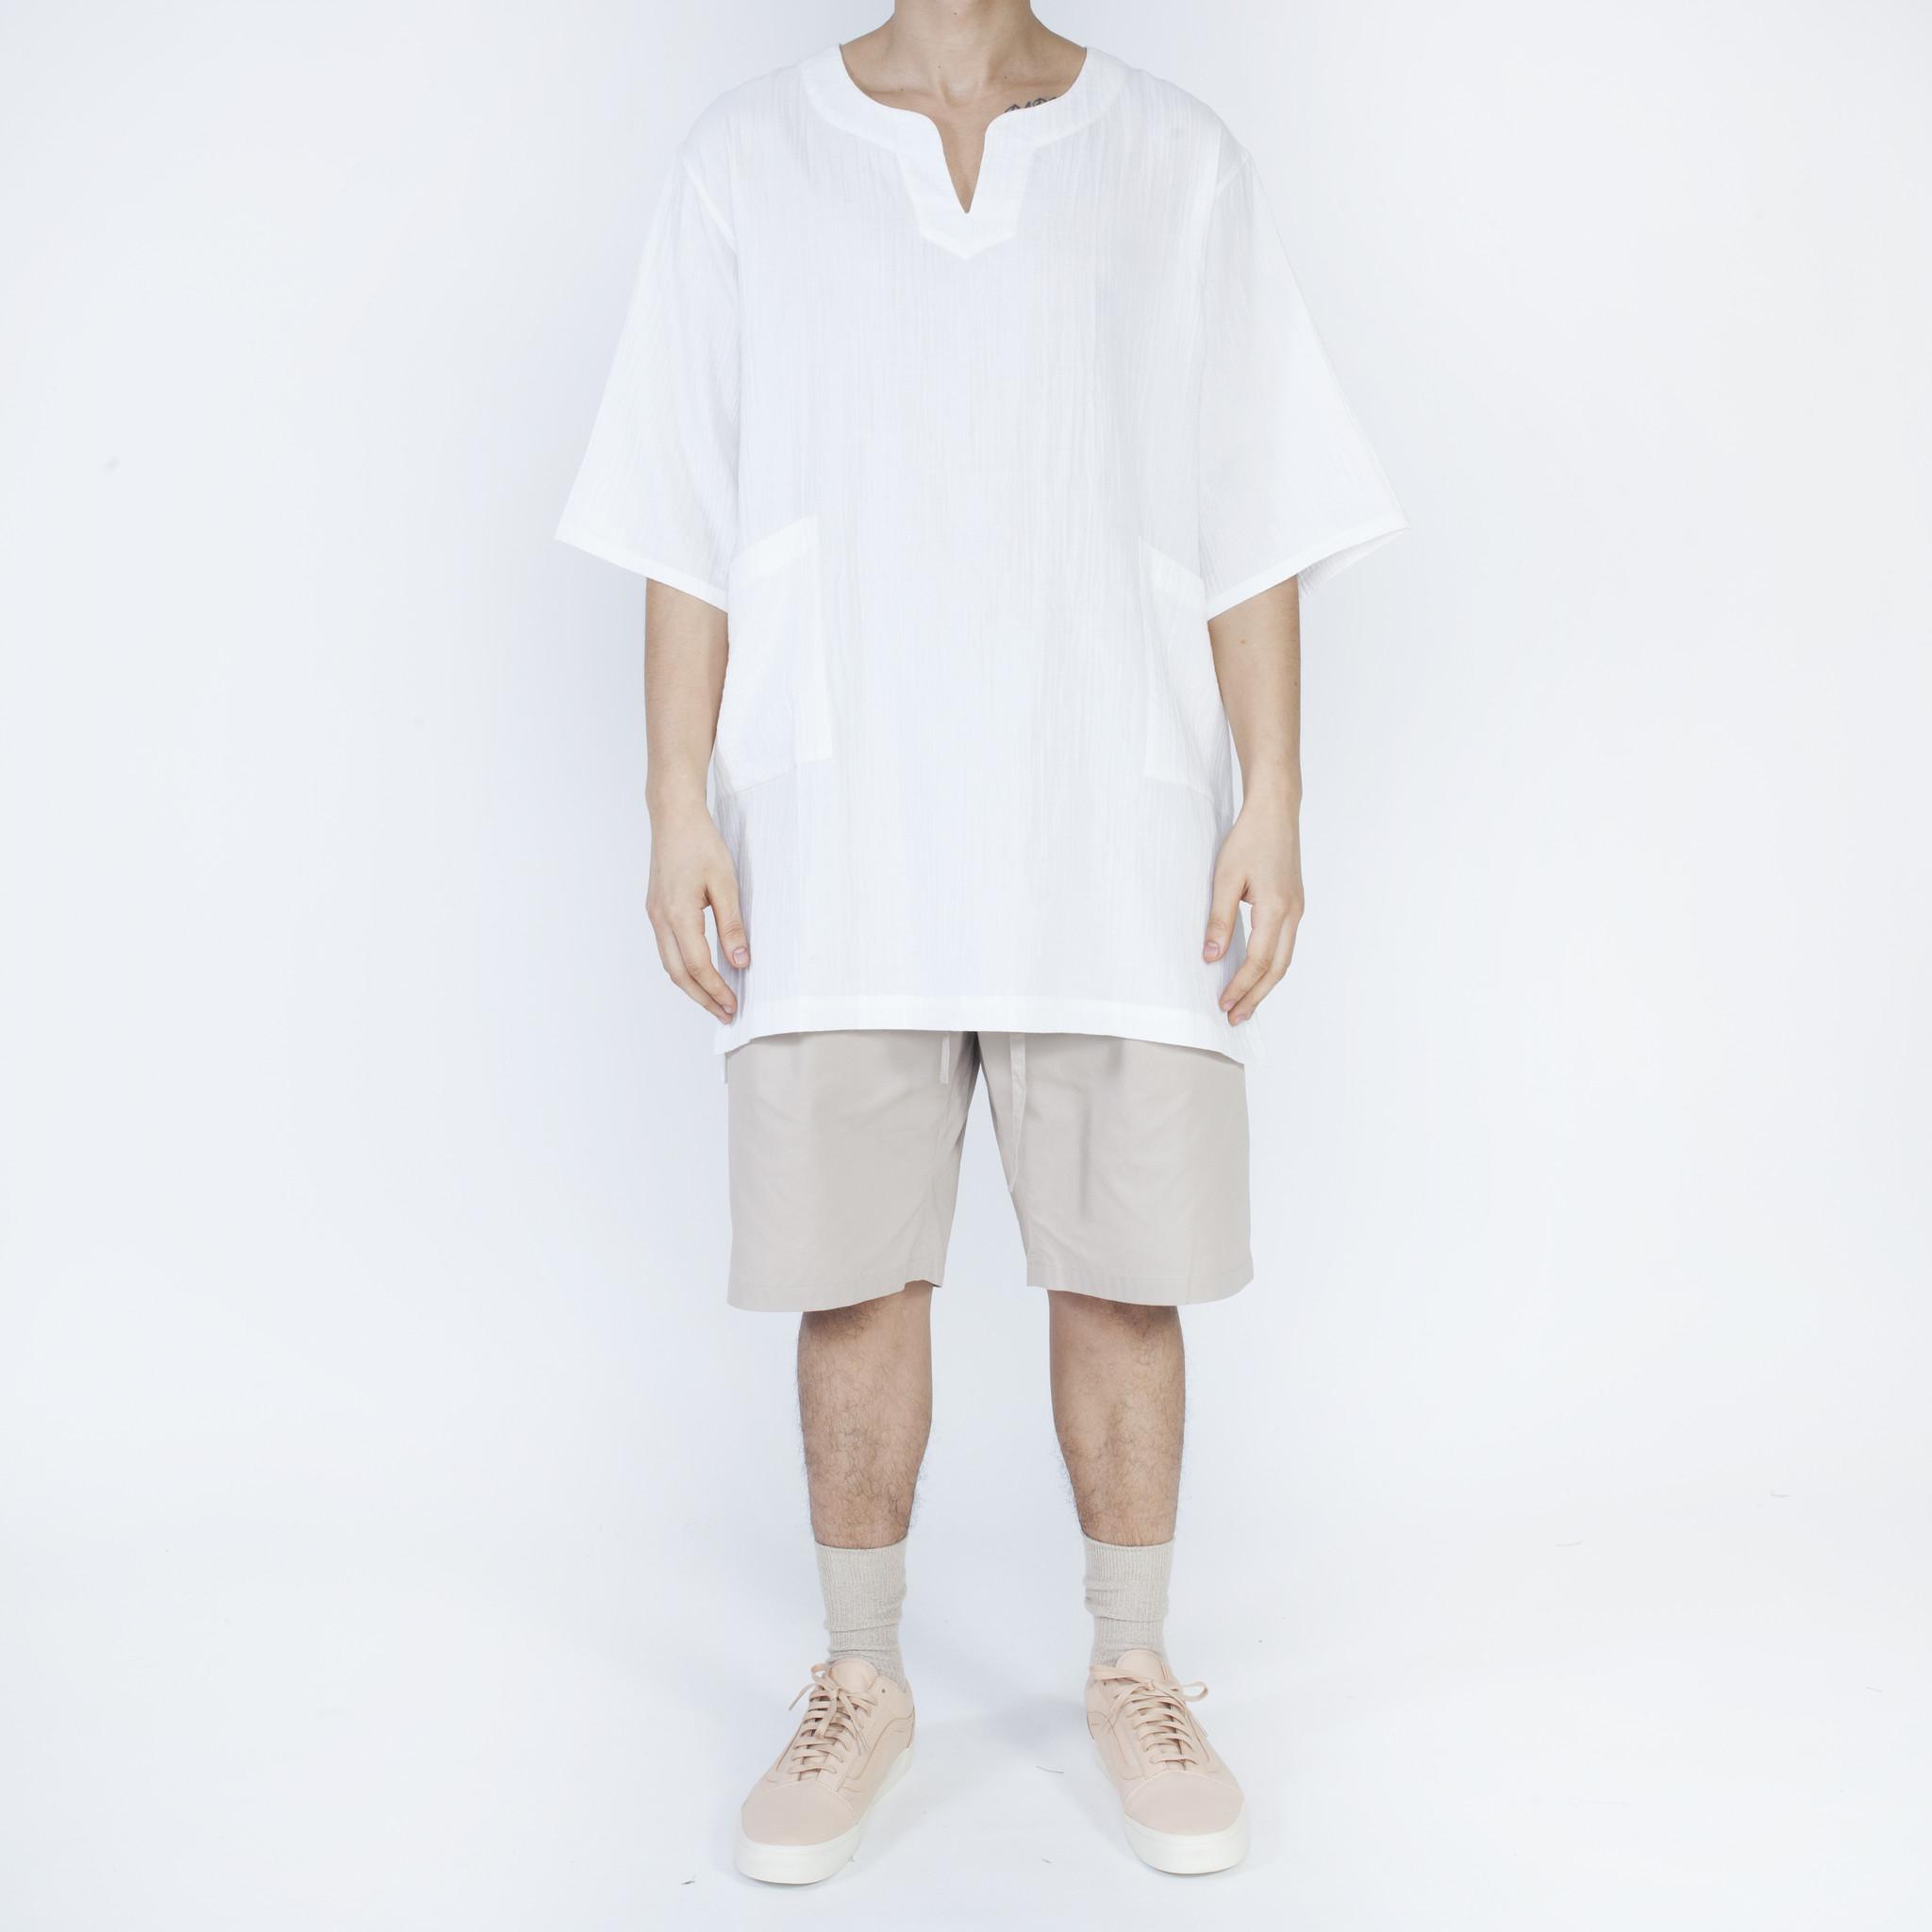 S K s k manor hill oba shirt white organic cotton garmentory